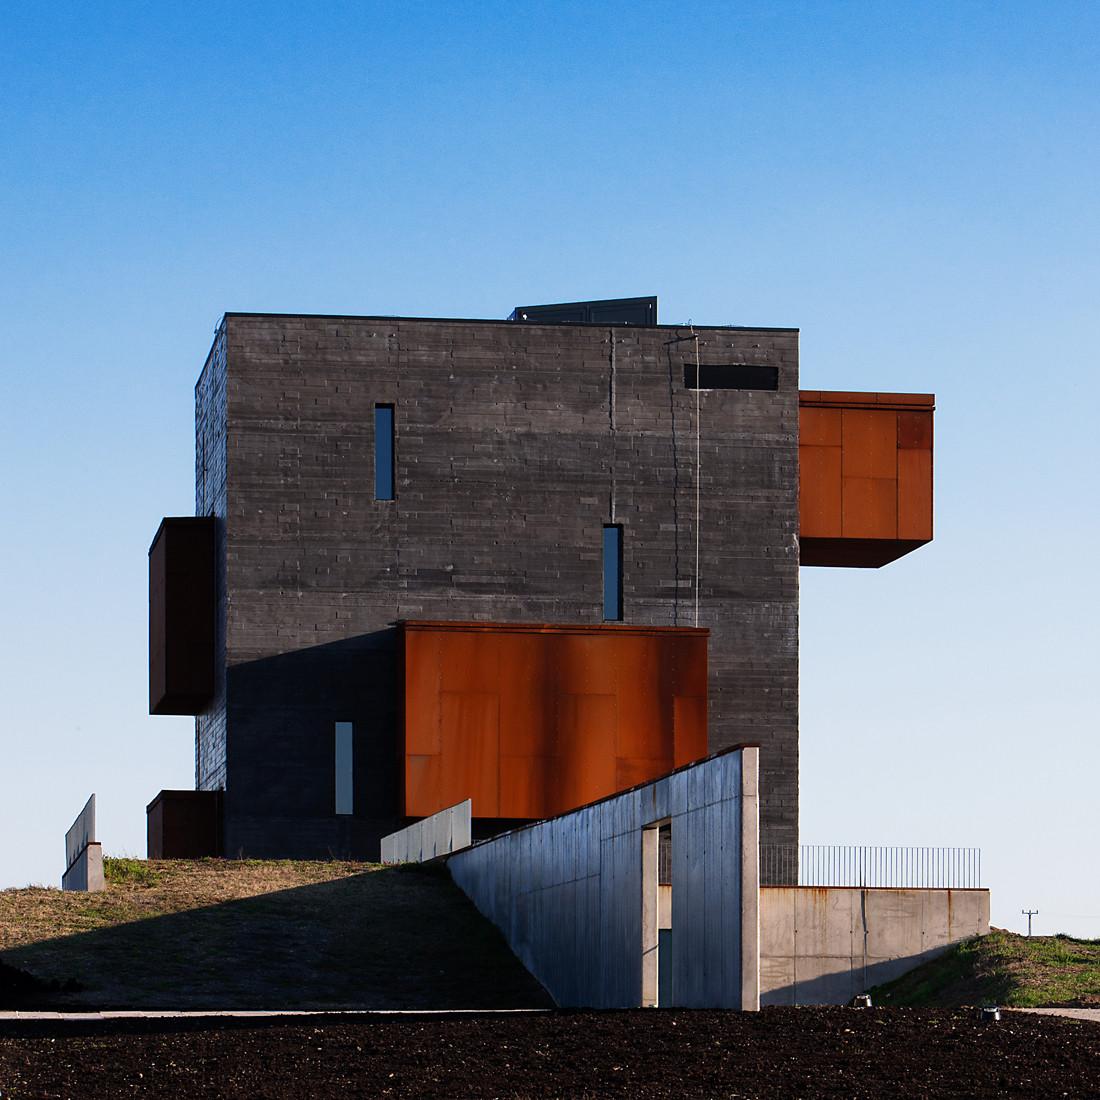 Kemenes Volcanopark Visitor Center / Foldes Architects